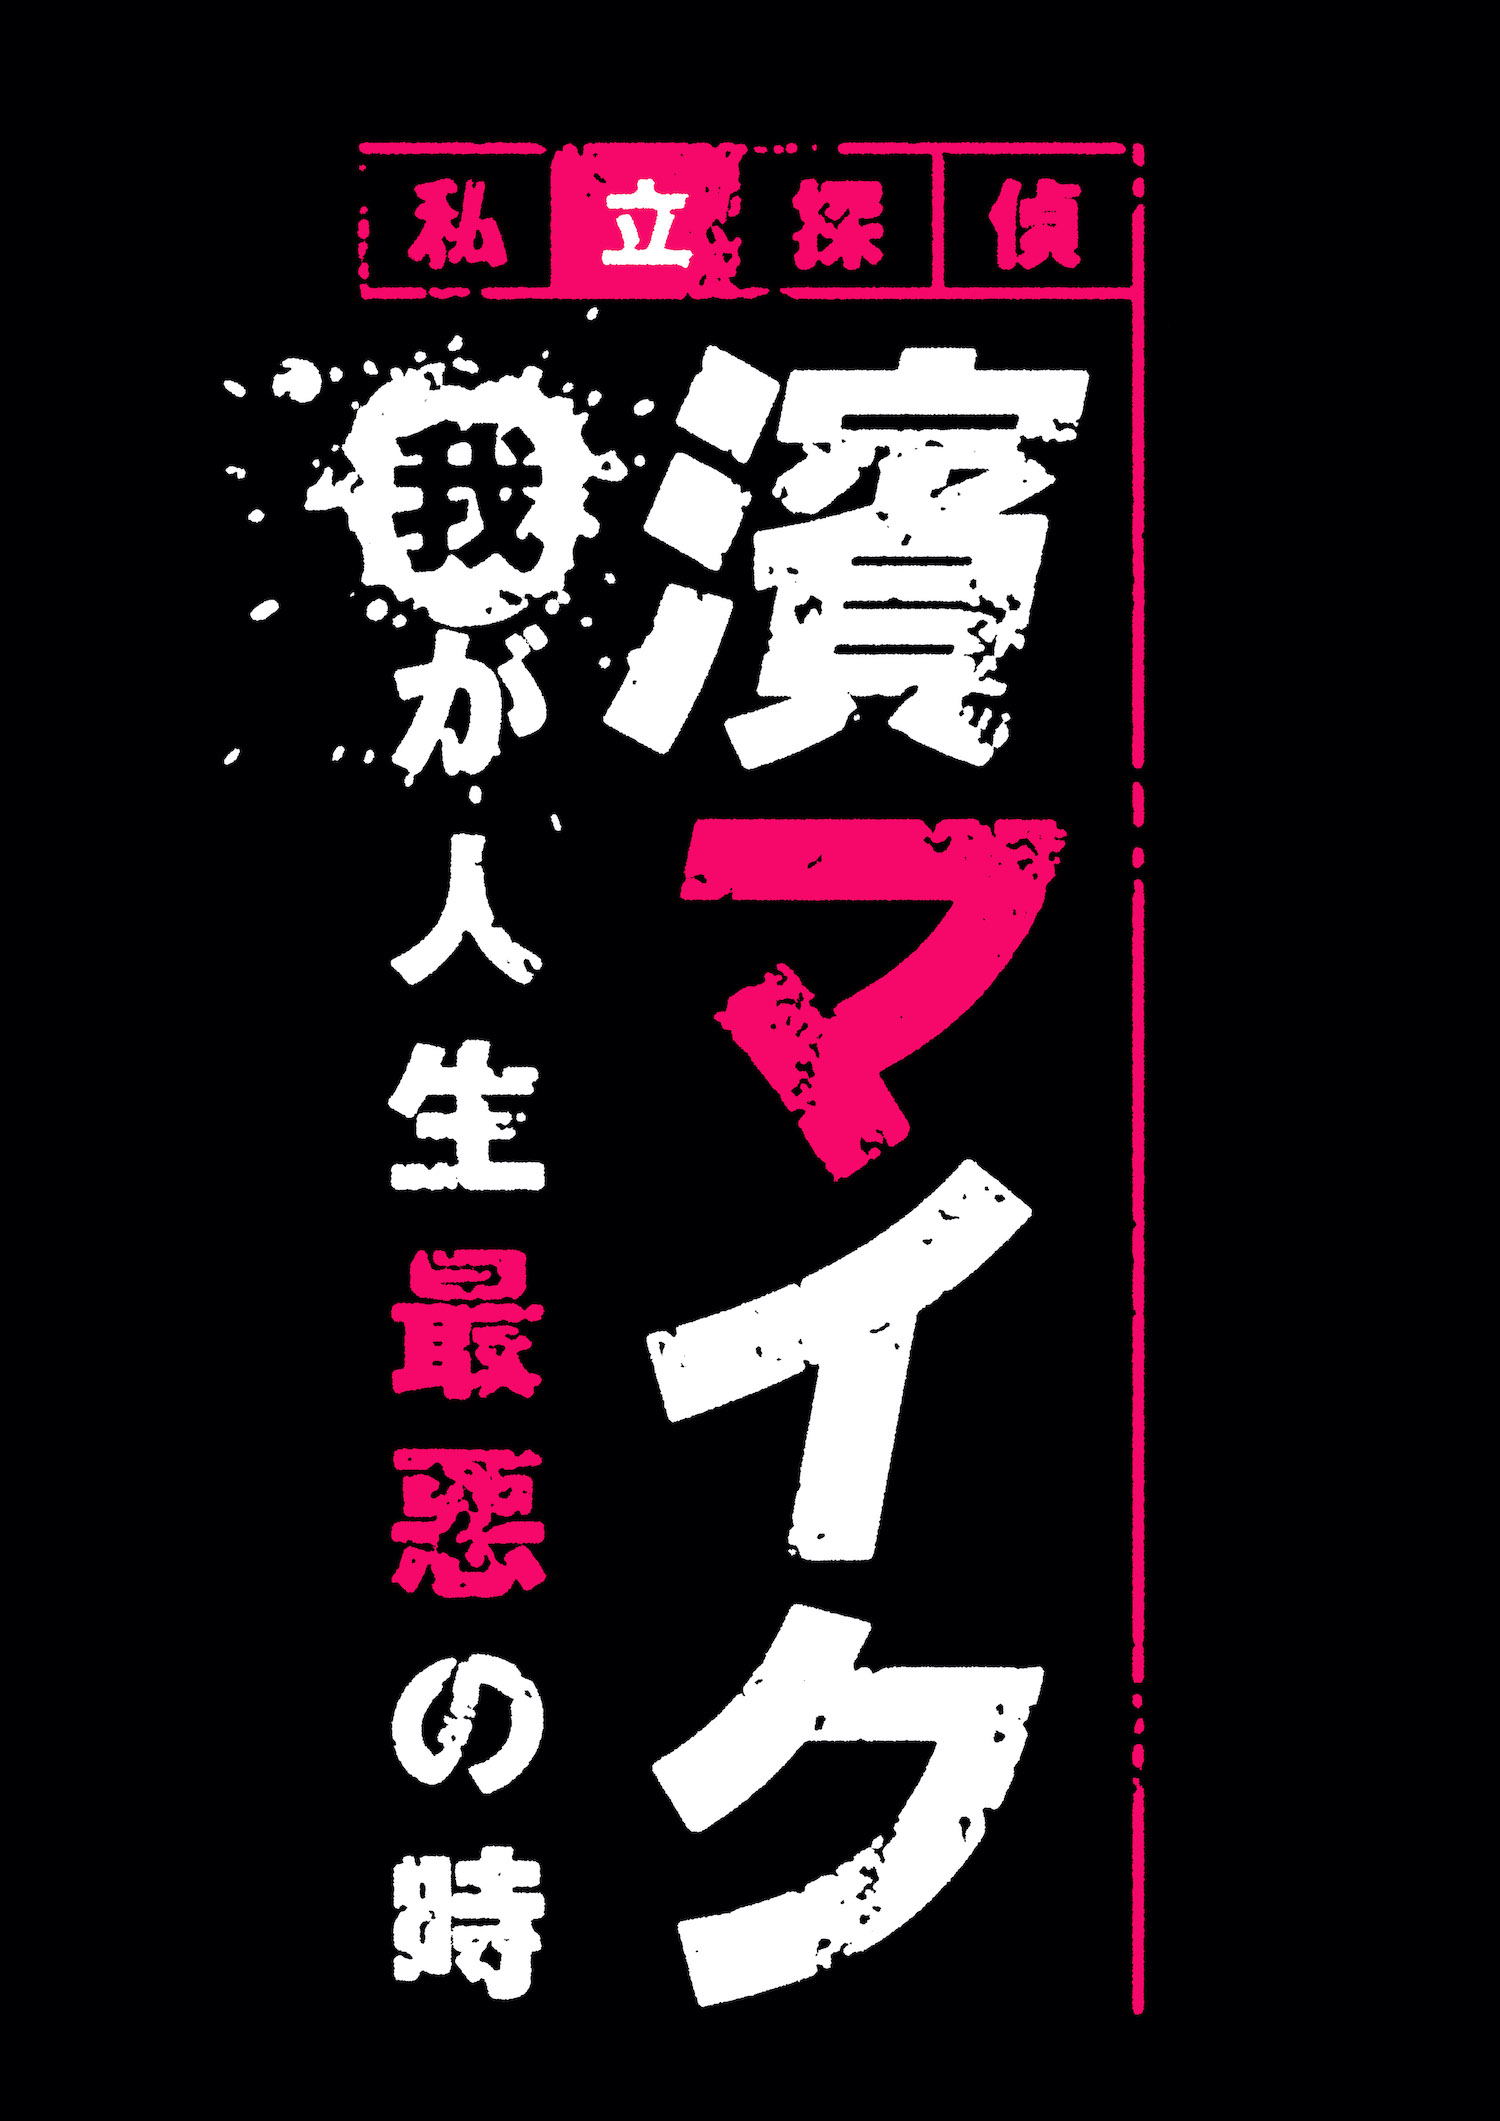 佐藤流司主演・朗読劇「私立探偵 濱マイク」、2D映像&VR映像で生配信決定 イメージ画像